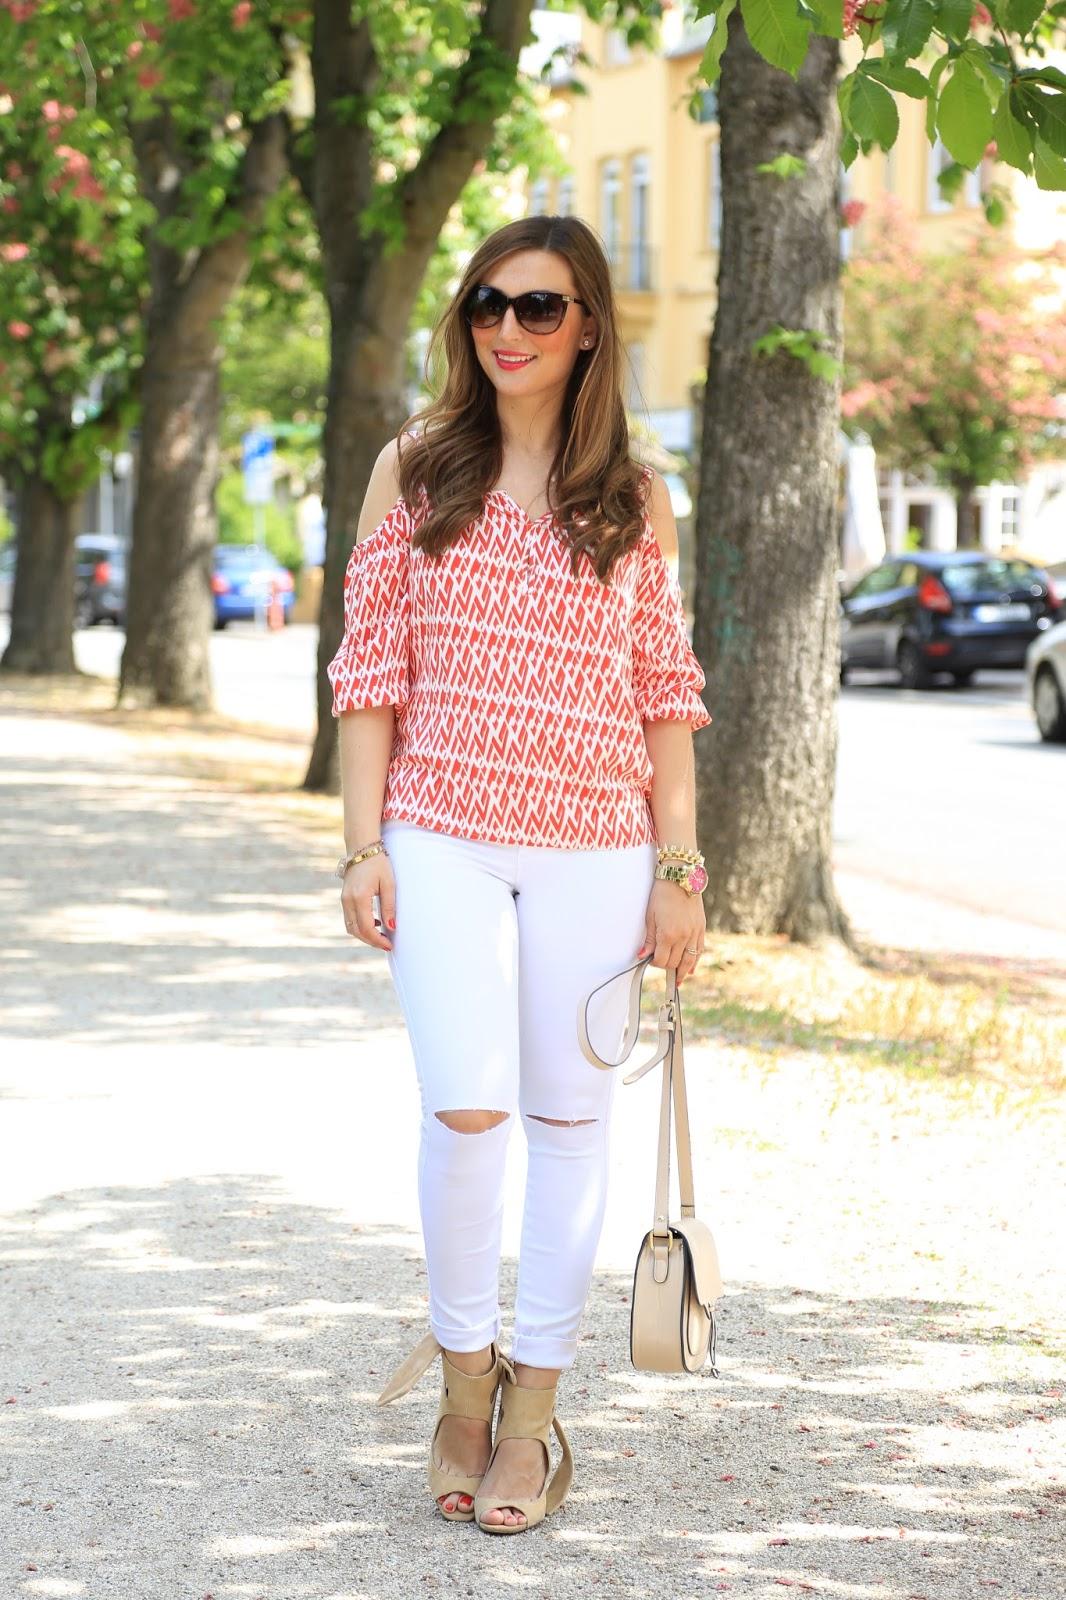 Off-Shoulder - Off-Shoulder Bluse - weiße Hose - Nude Heels - was zieht man im sommer an - Inspirationen für den Sommer - Sommertrend 2016 - Fashionblogger Looks